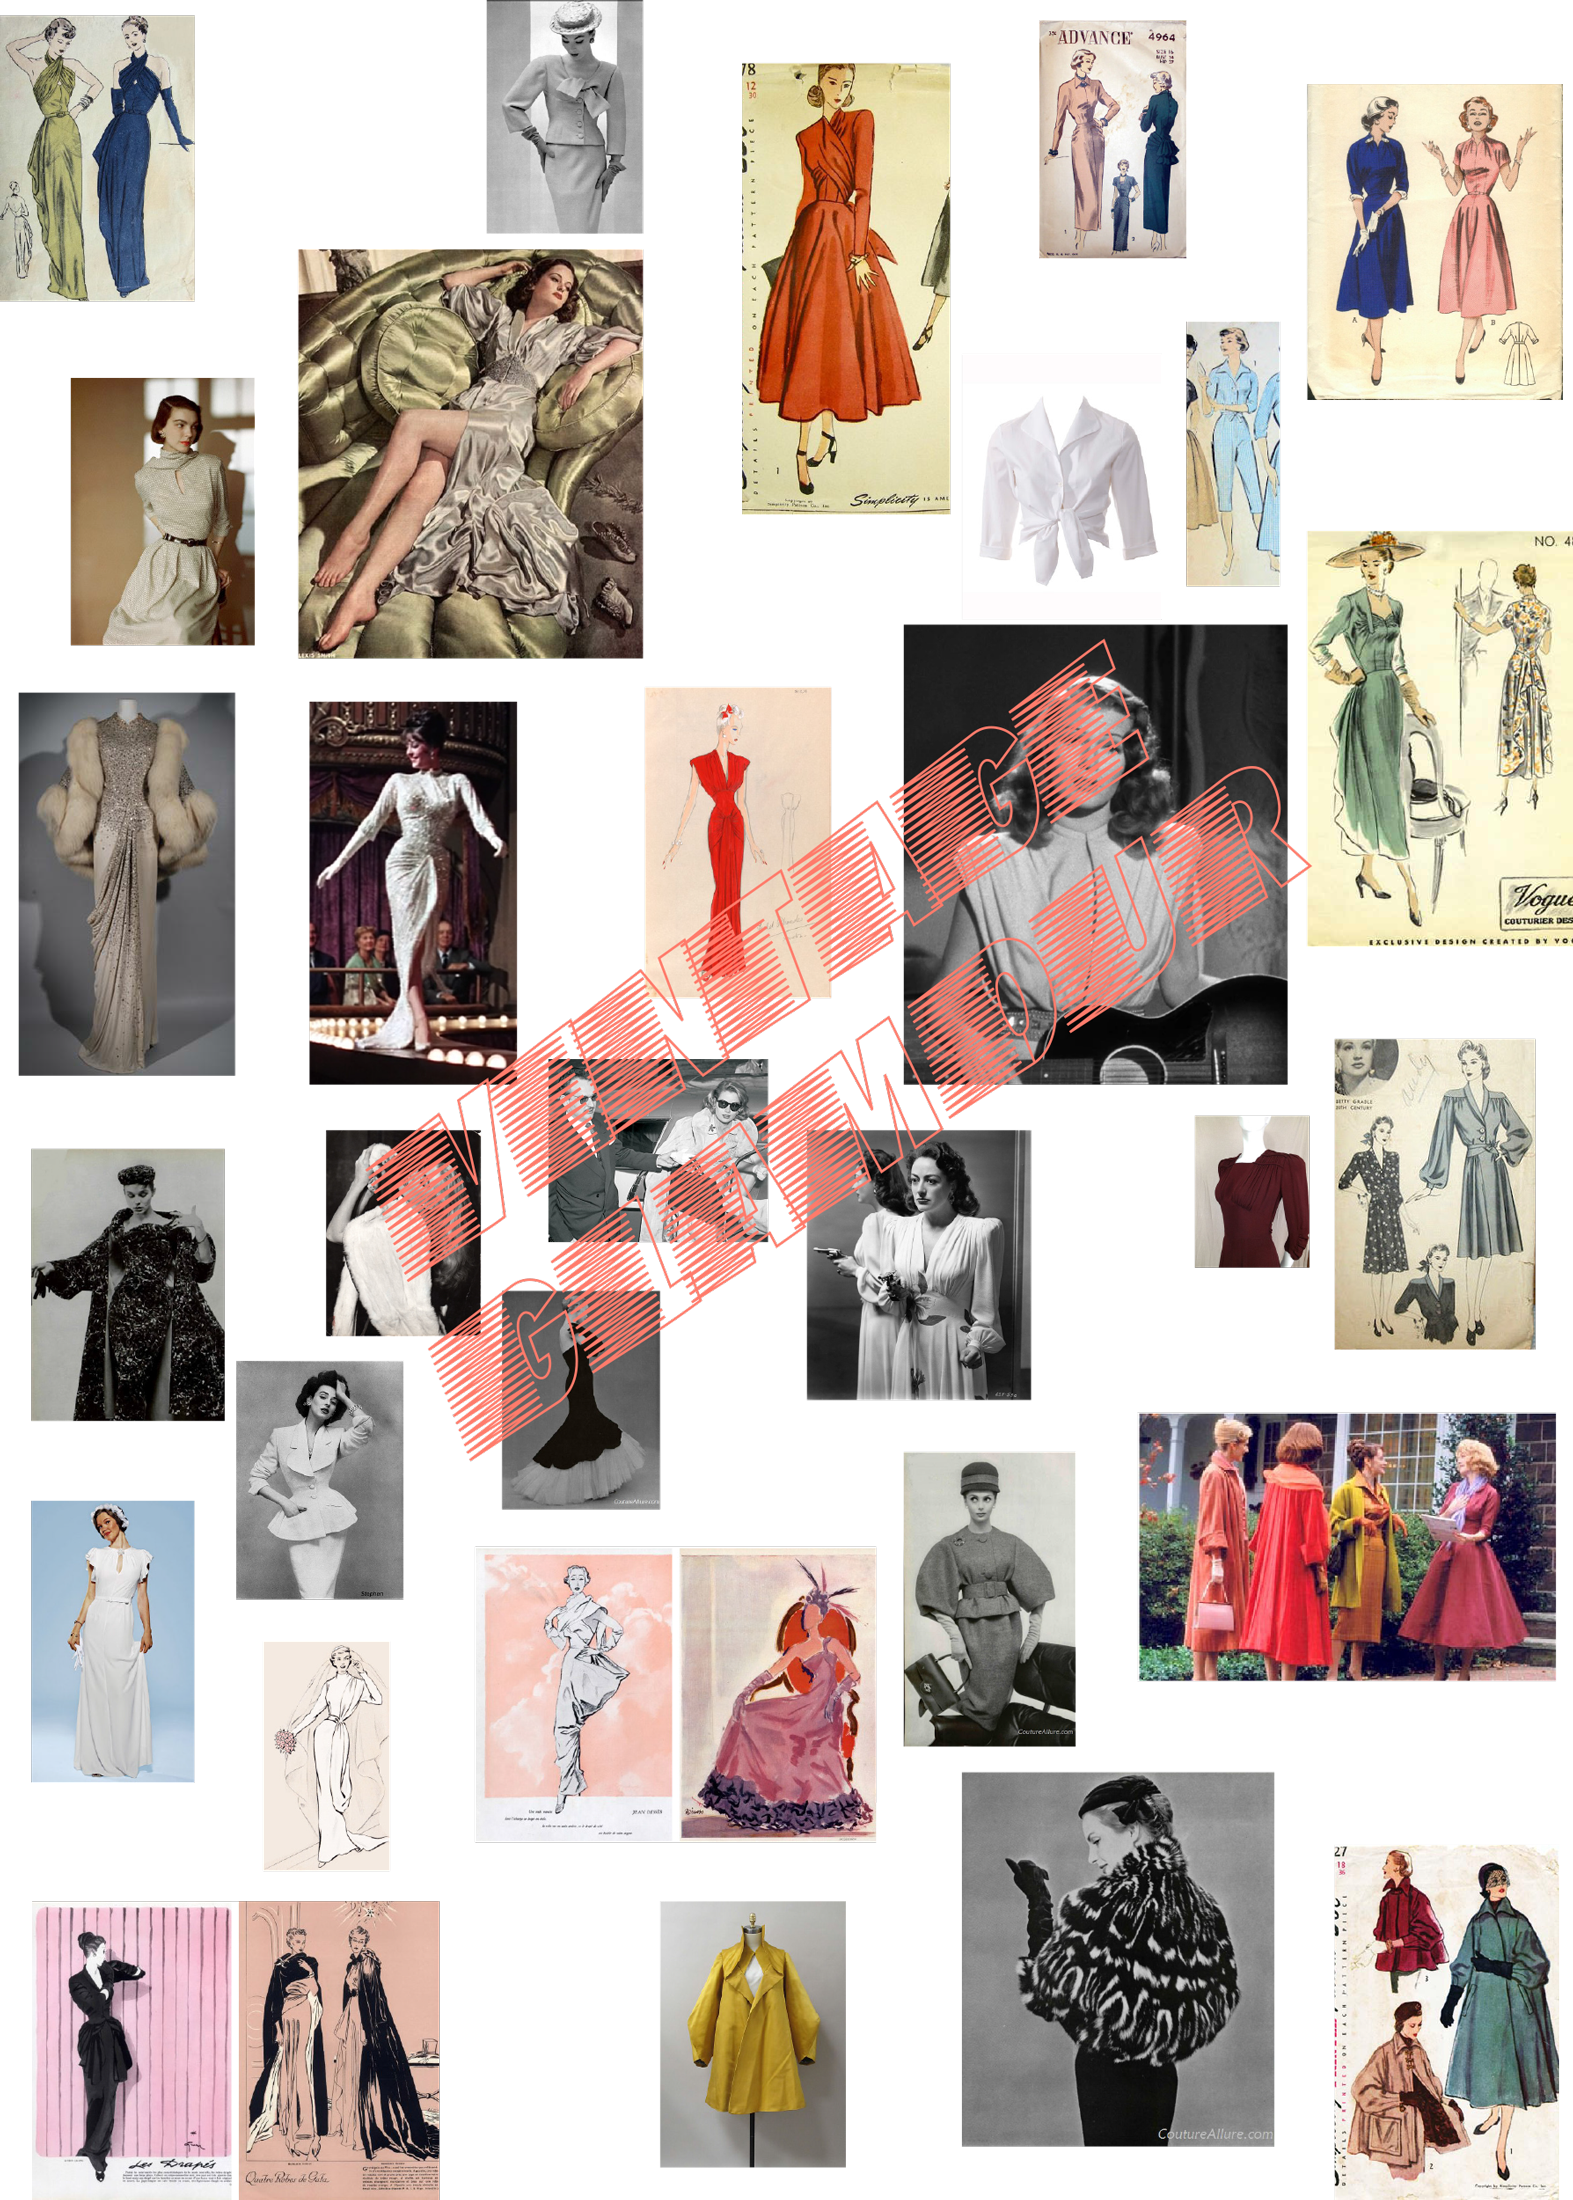 a mood board of glamorous vintage fashion inspiration